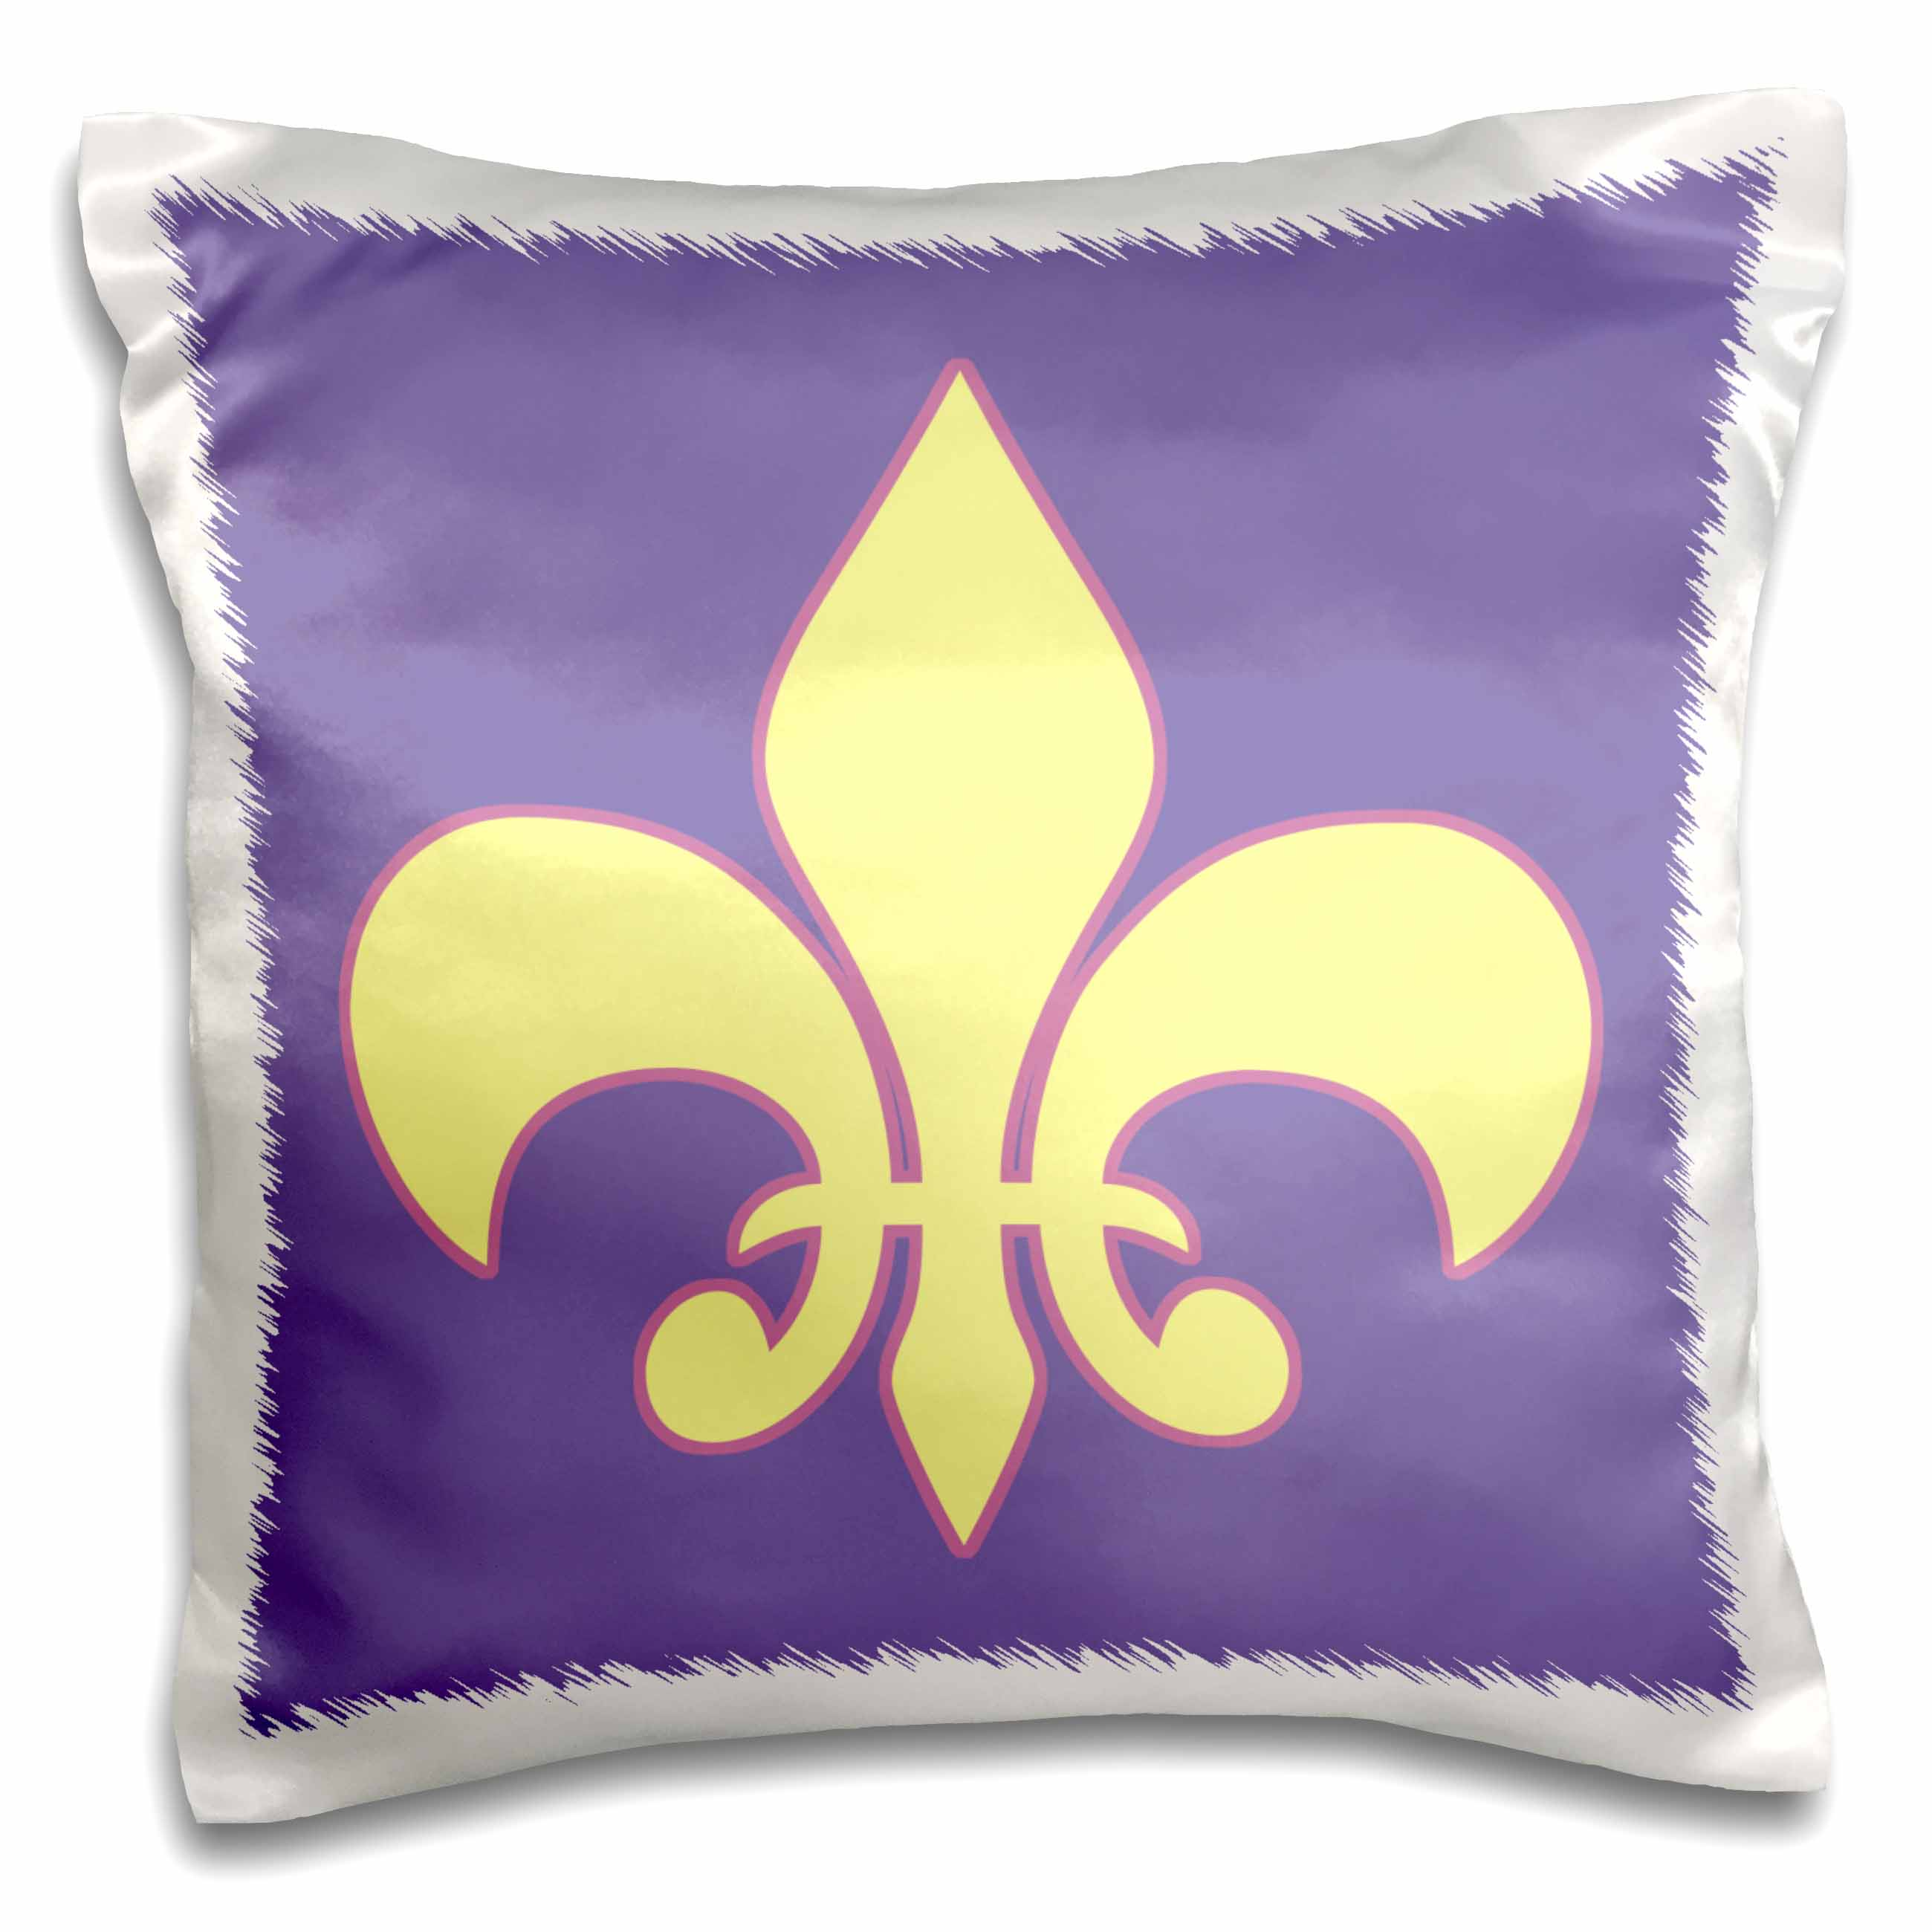 3dRose Pale Canary Yellow Fleur-de-lis outlined purple, lavender background, Pillow Case, 16 by 16-inch